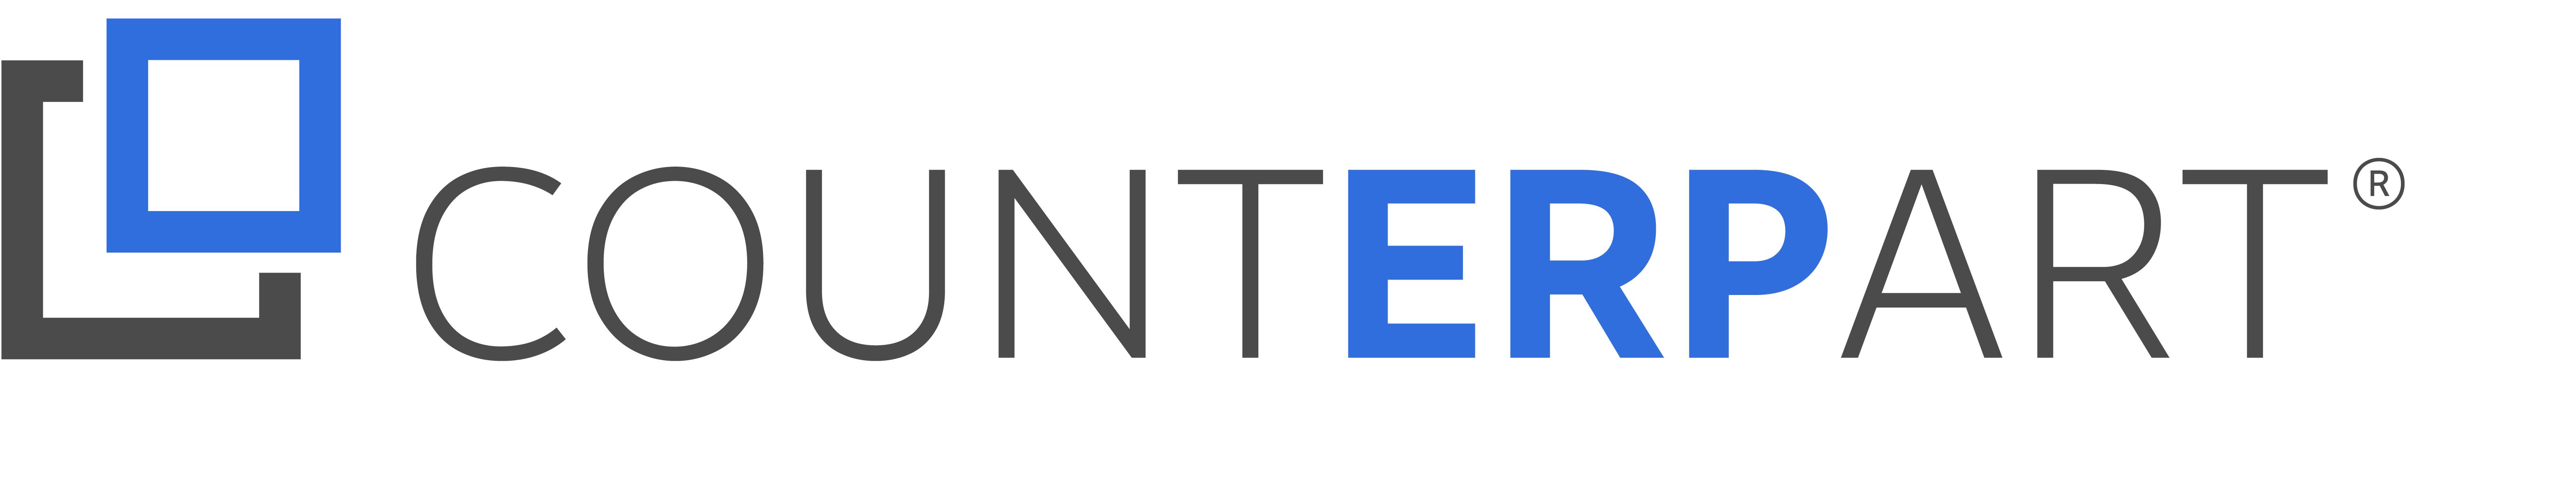 Andrew Schutte of COUNTERPART ETO ERP Talks Engineering Efficiency on Industrial Talk Podcast